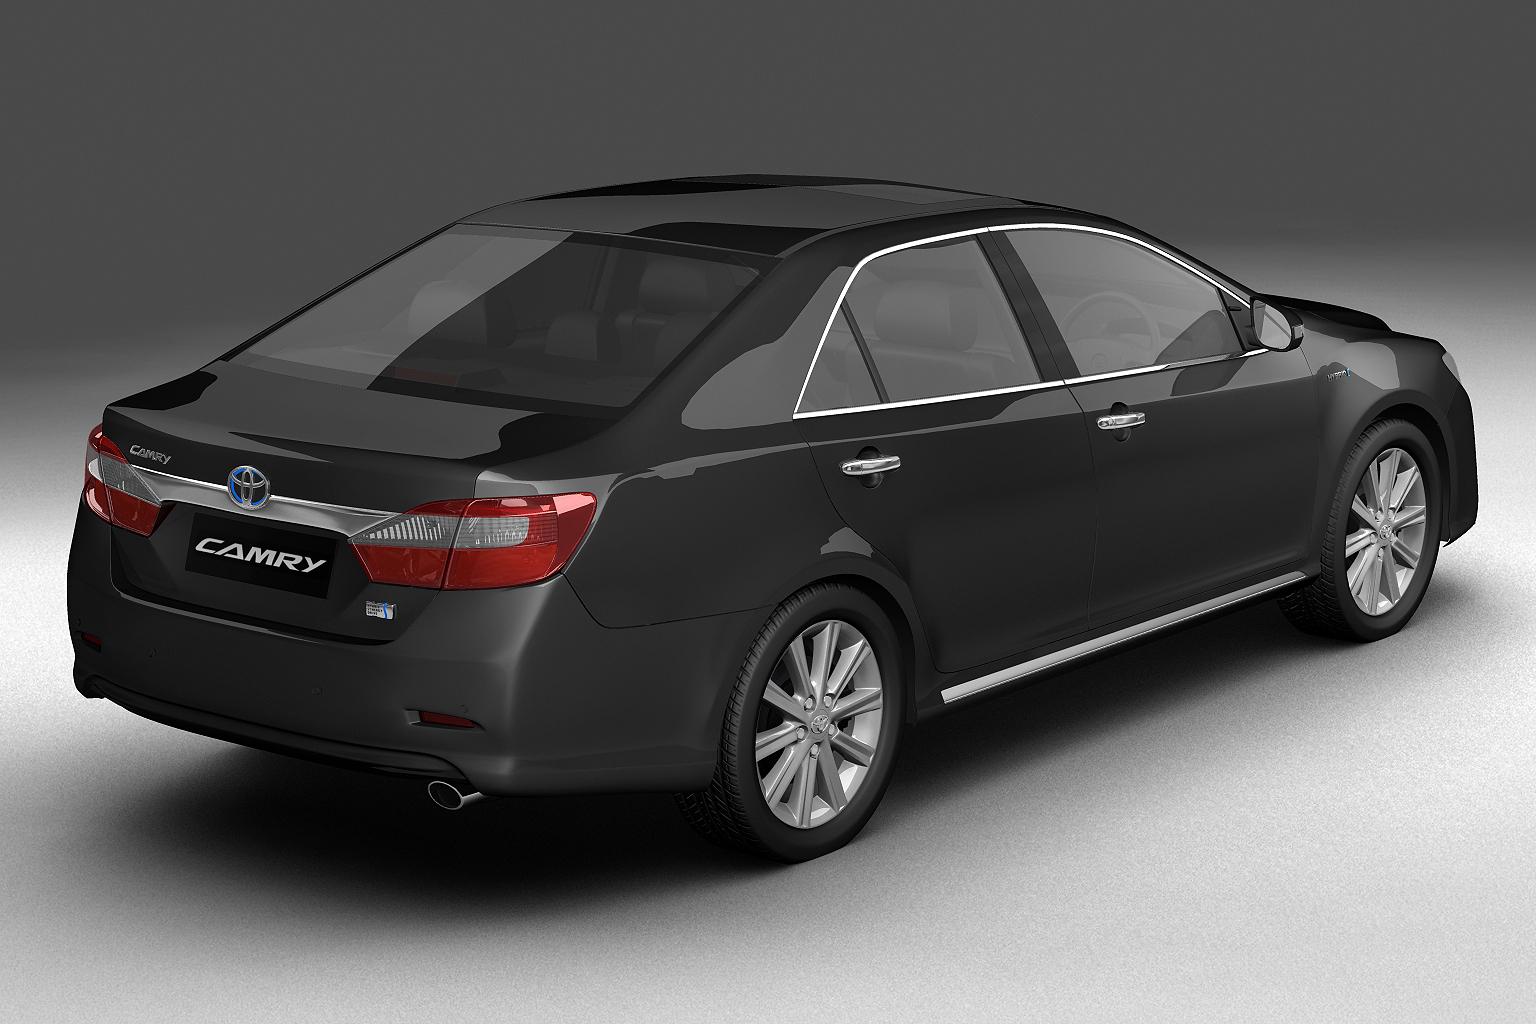 2012 toyota camry model 3d hybrid (asian) 3ds max fbx c4d lwo hrc xsi obj 136185